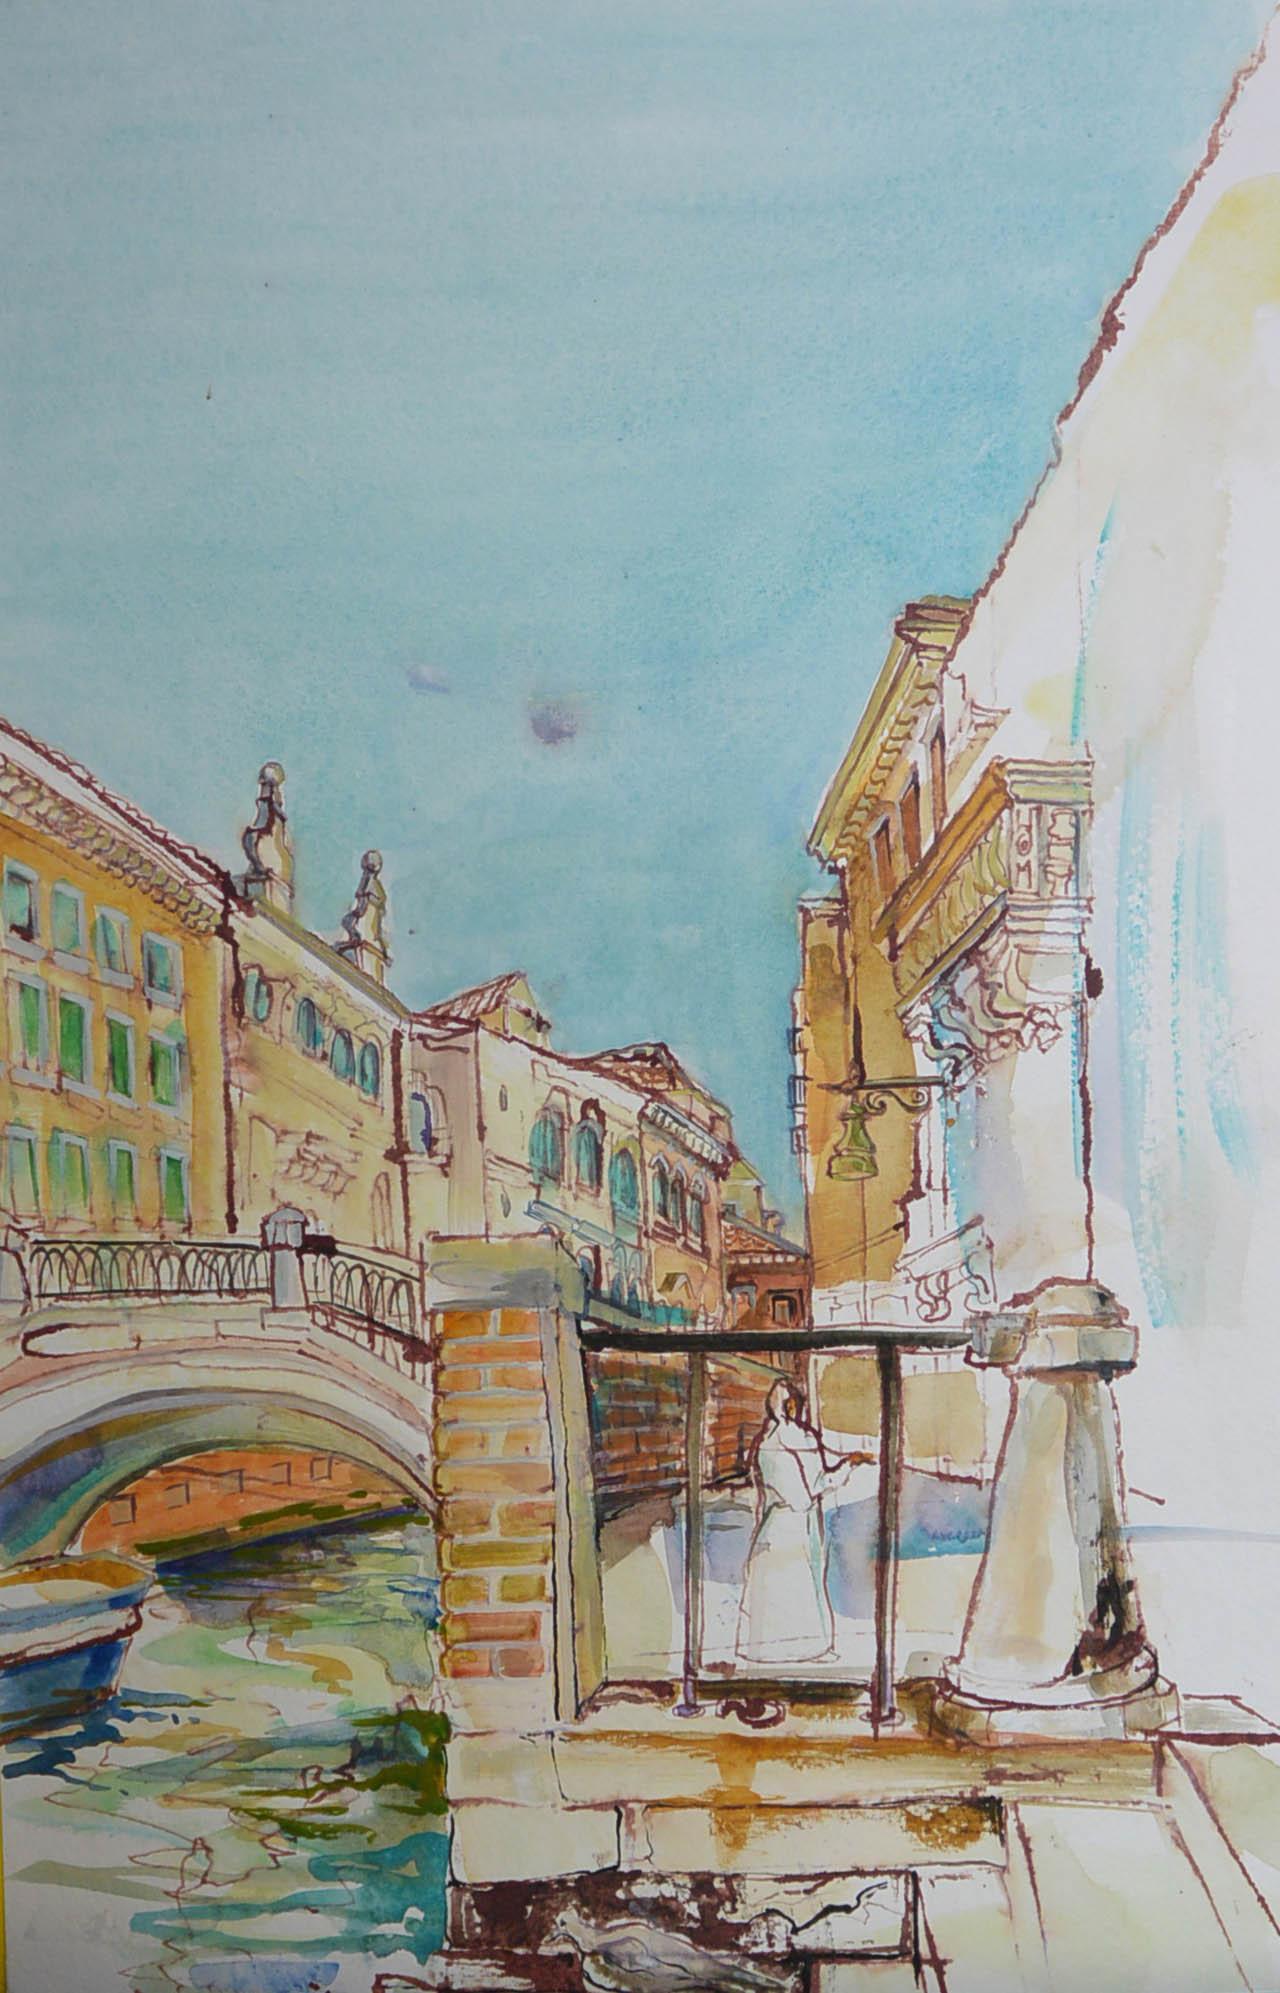 Venice 3, by Carol Nunnelly